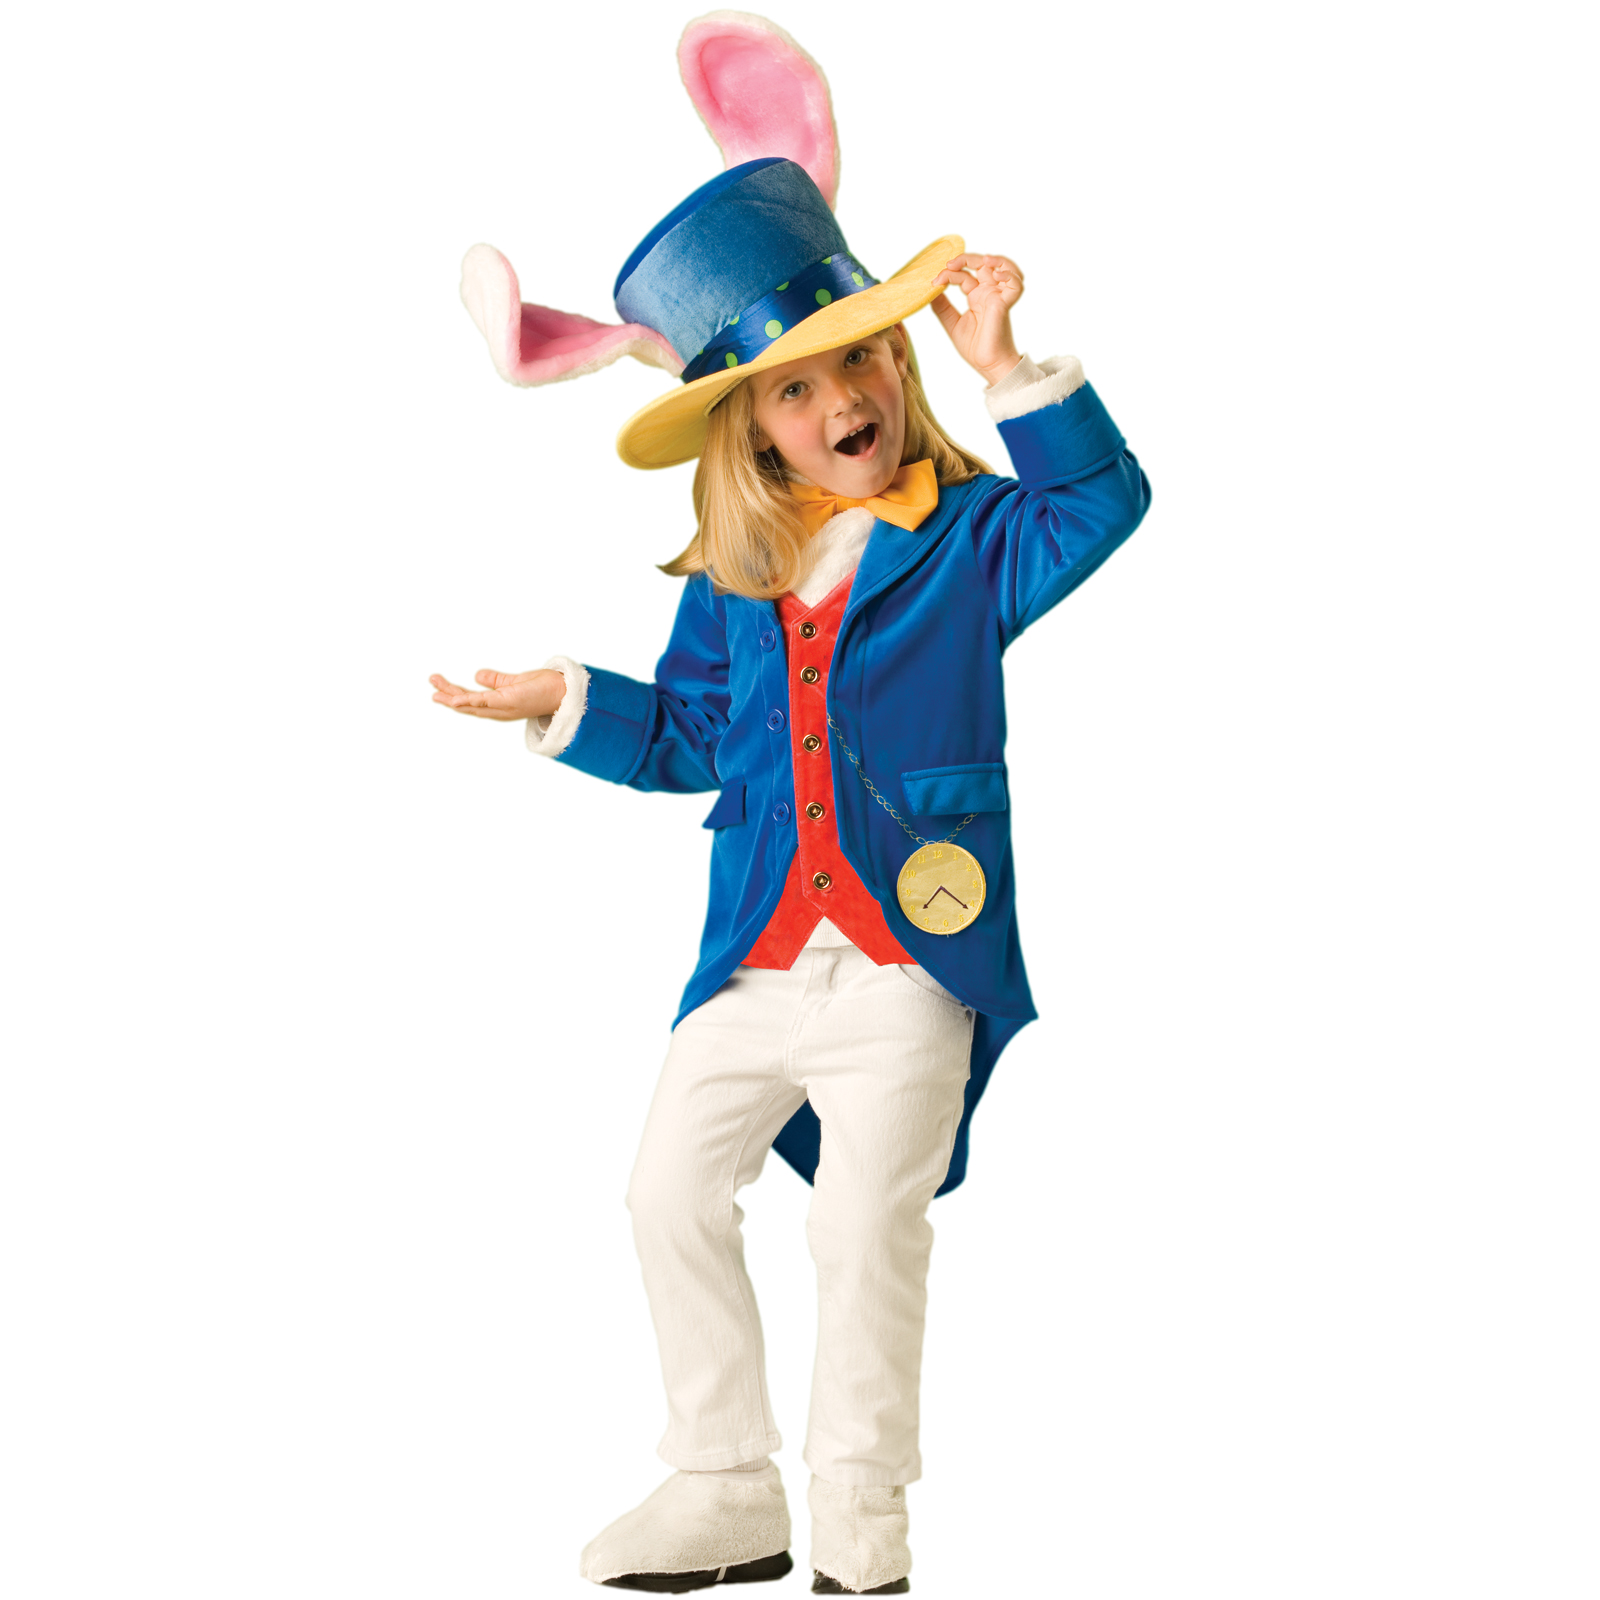 Alice in bunny costume and stockings masturbating 8